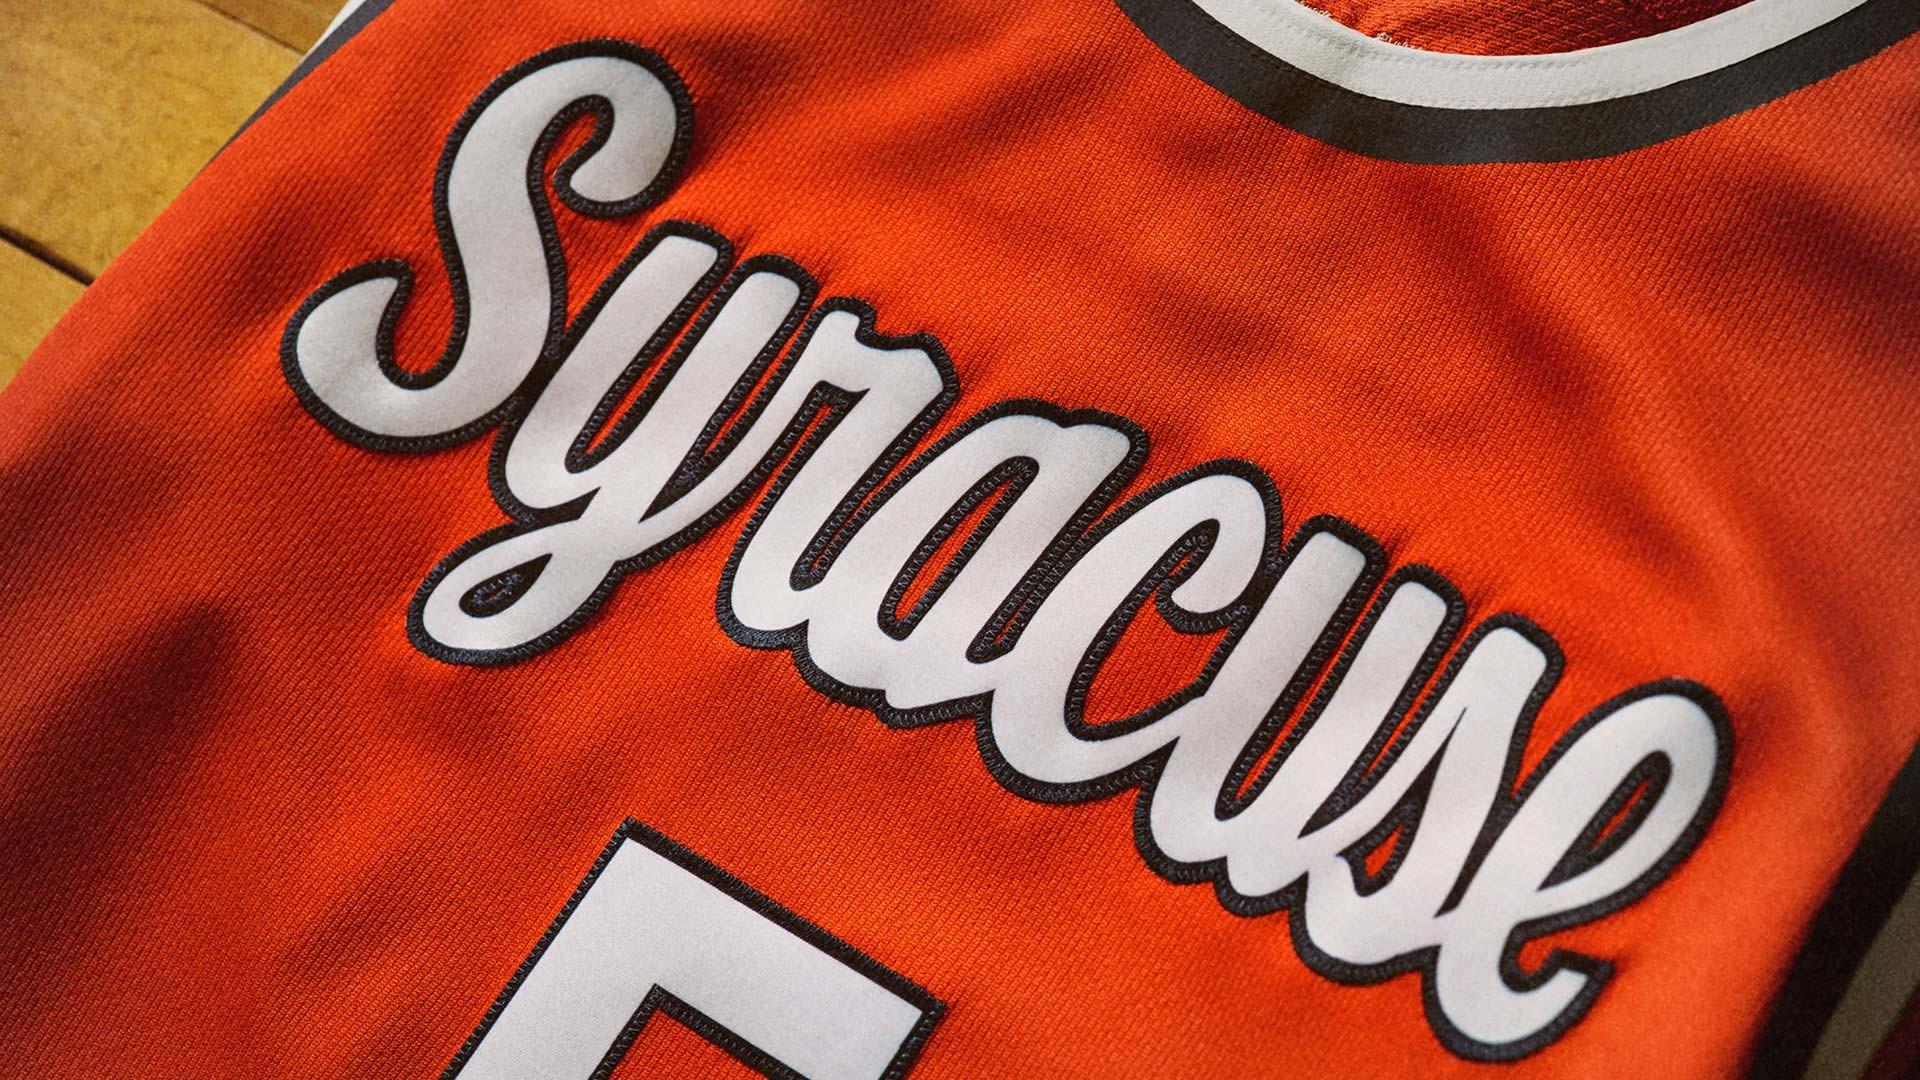 Res: 1920x1080, Syracuse Orange iPhone Wallpaper Source · Syracuse bringing back a classic  uniform look vs Boston College